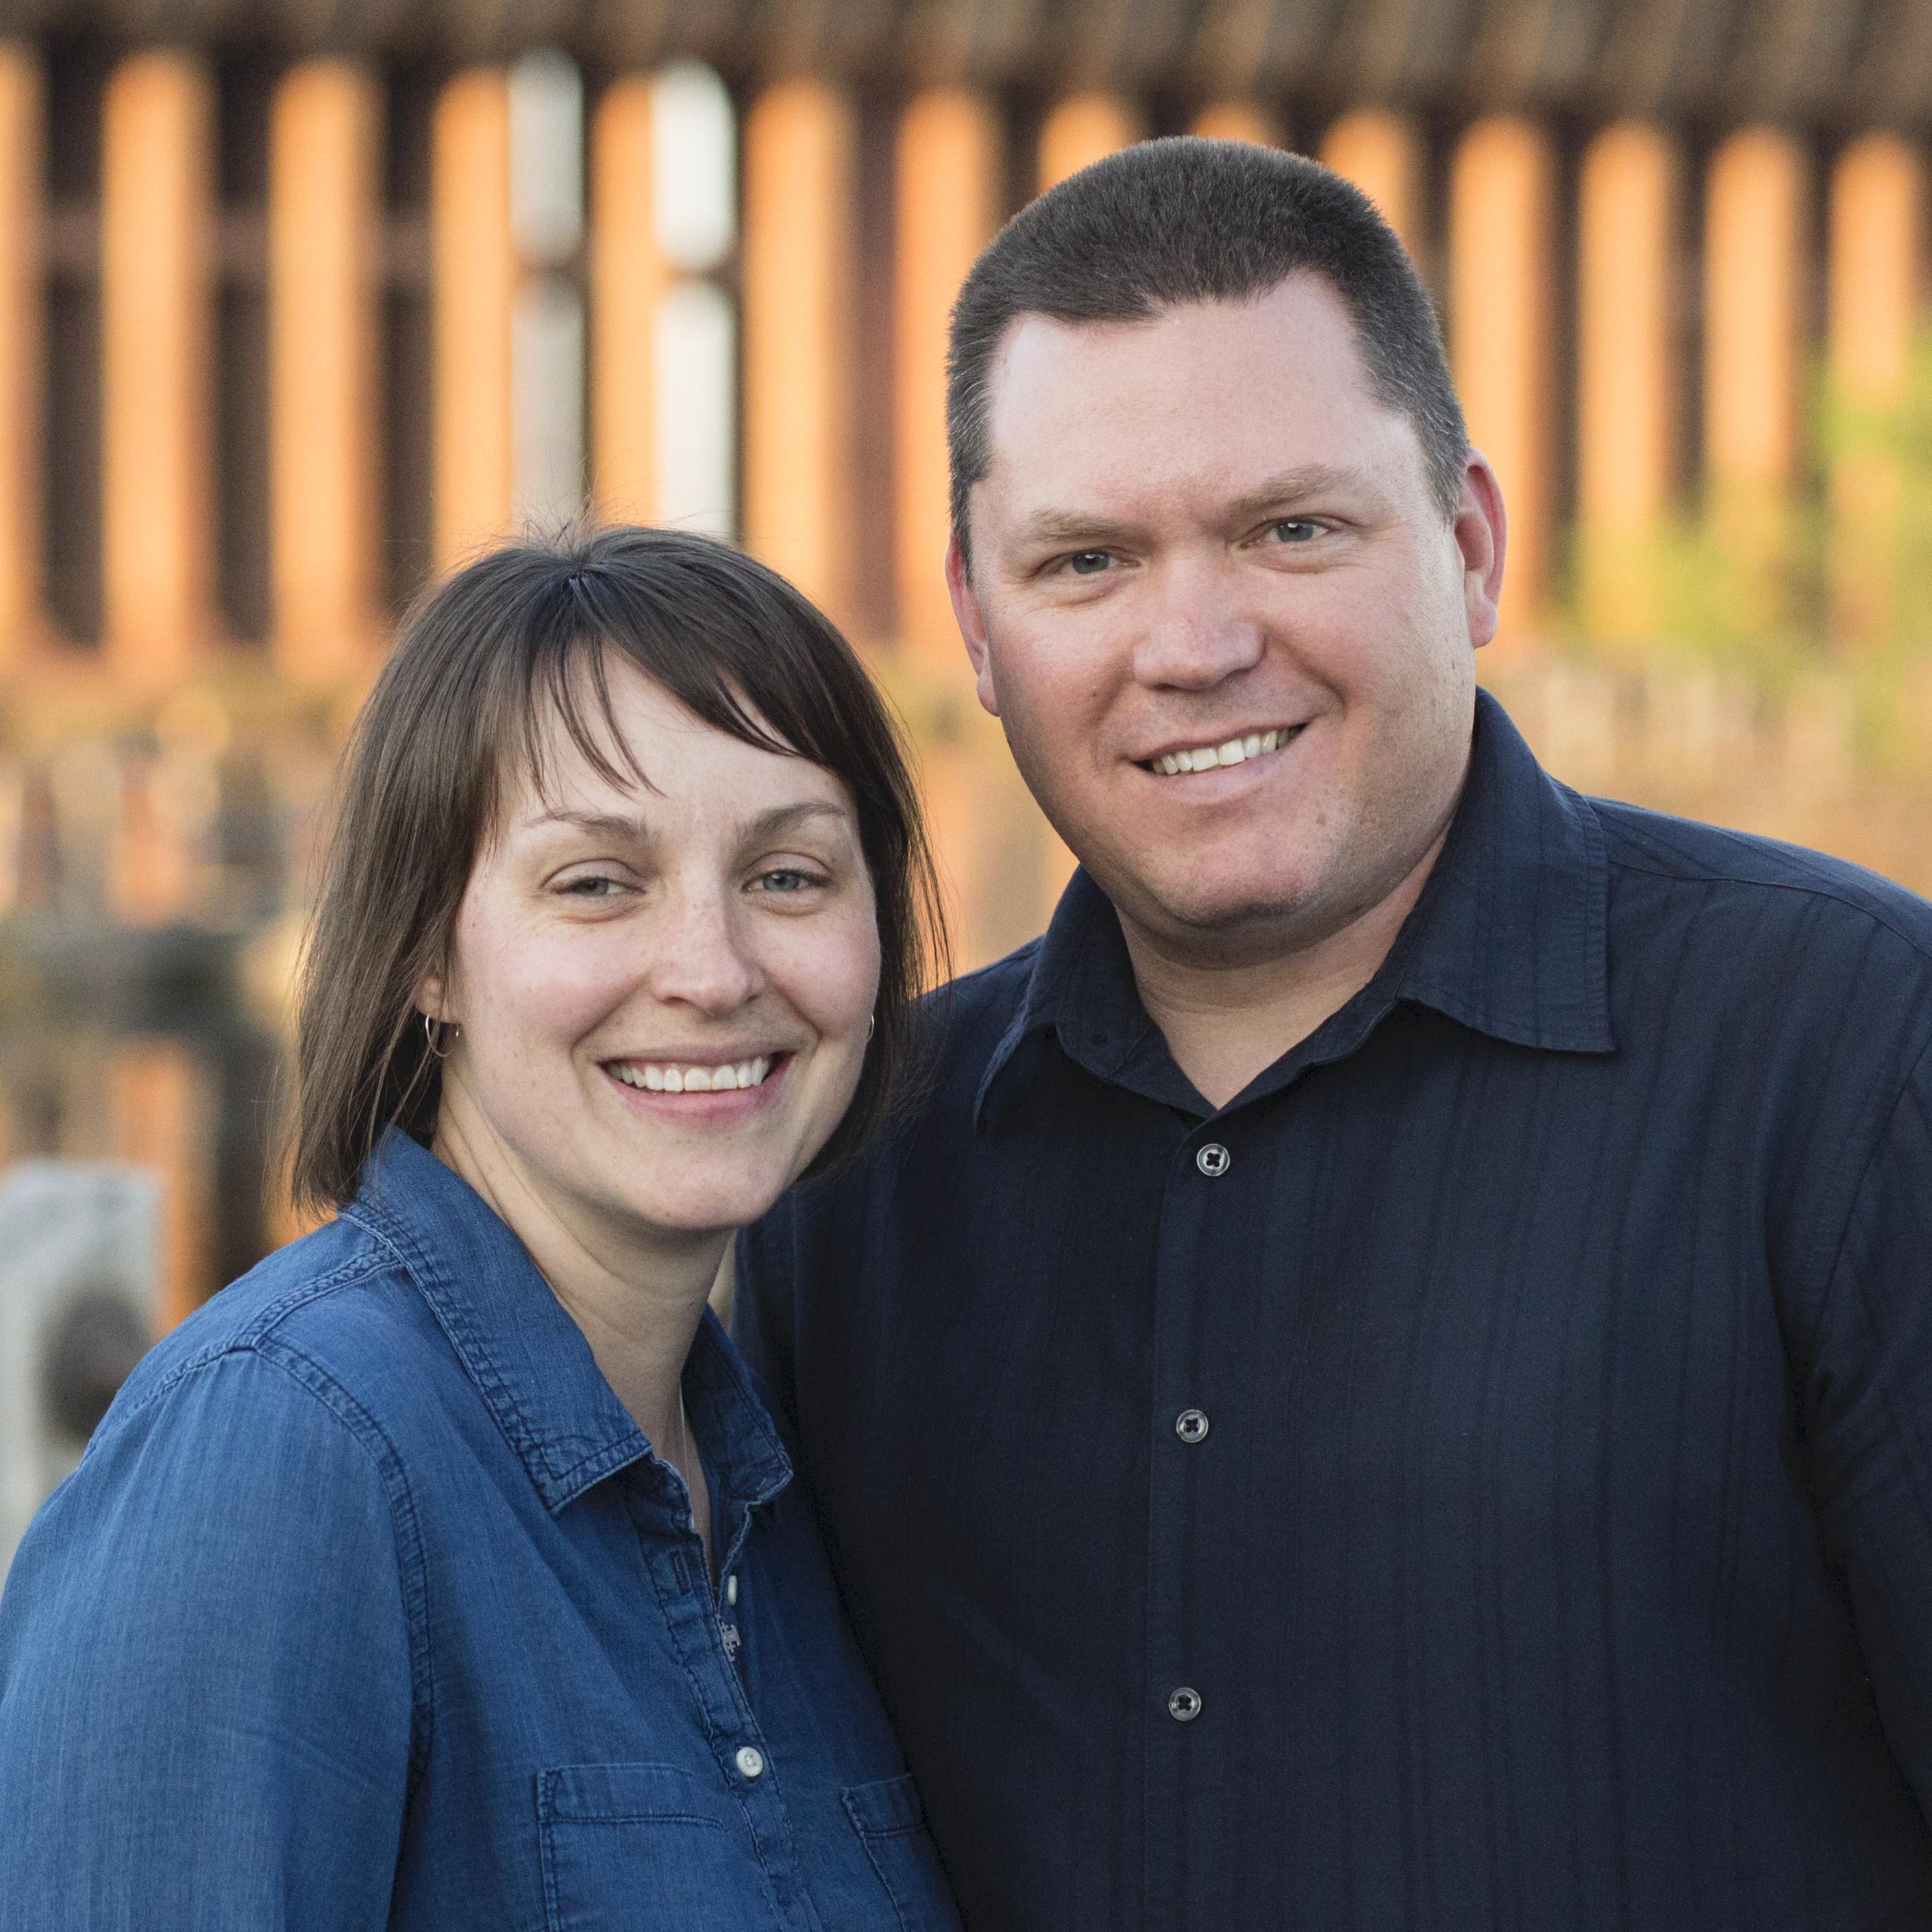 Nikki and Mike Murray 2019